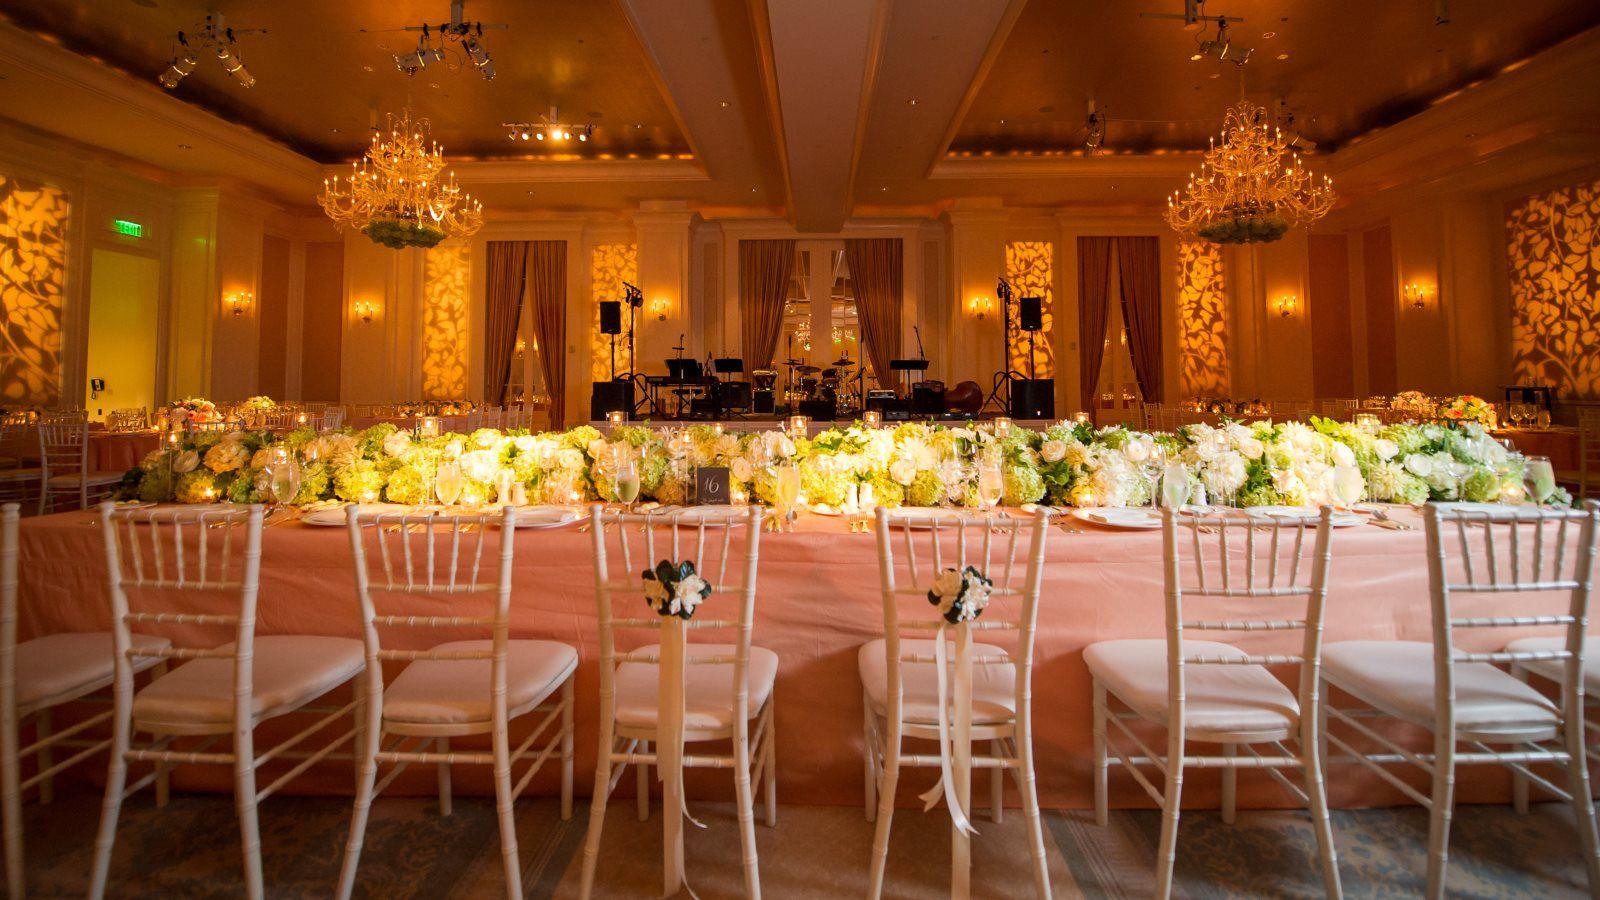 Best Wedding Reception Venues Atlanta Ga 2 28 Images 22 Best